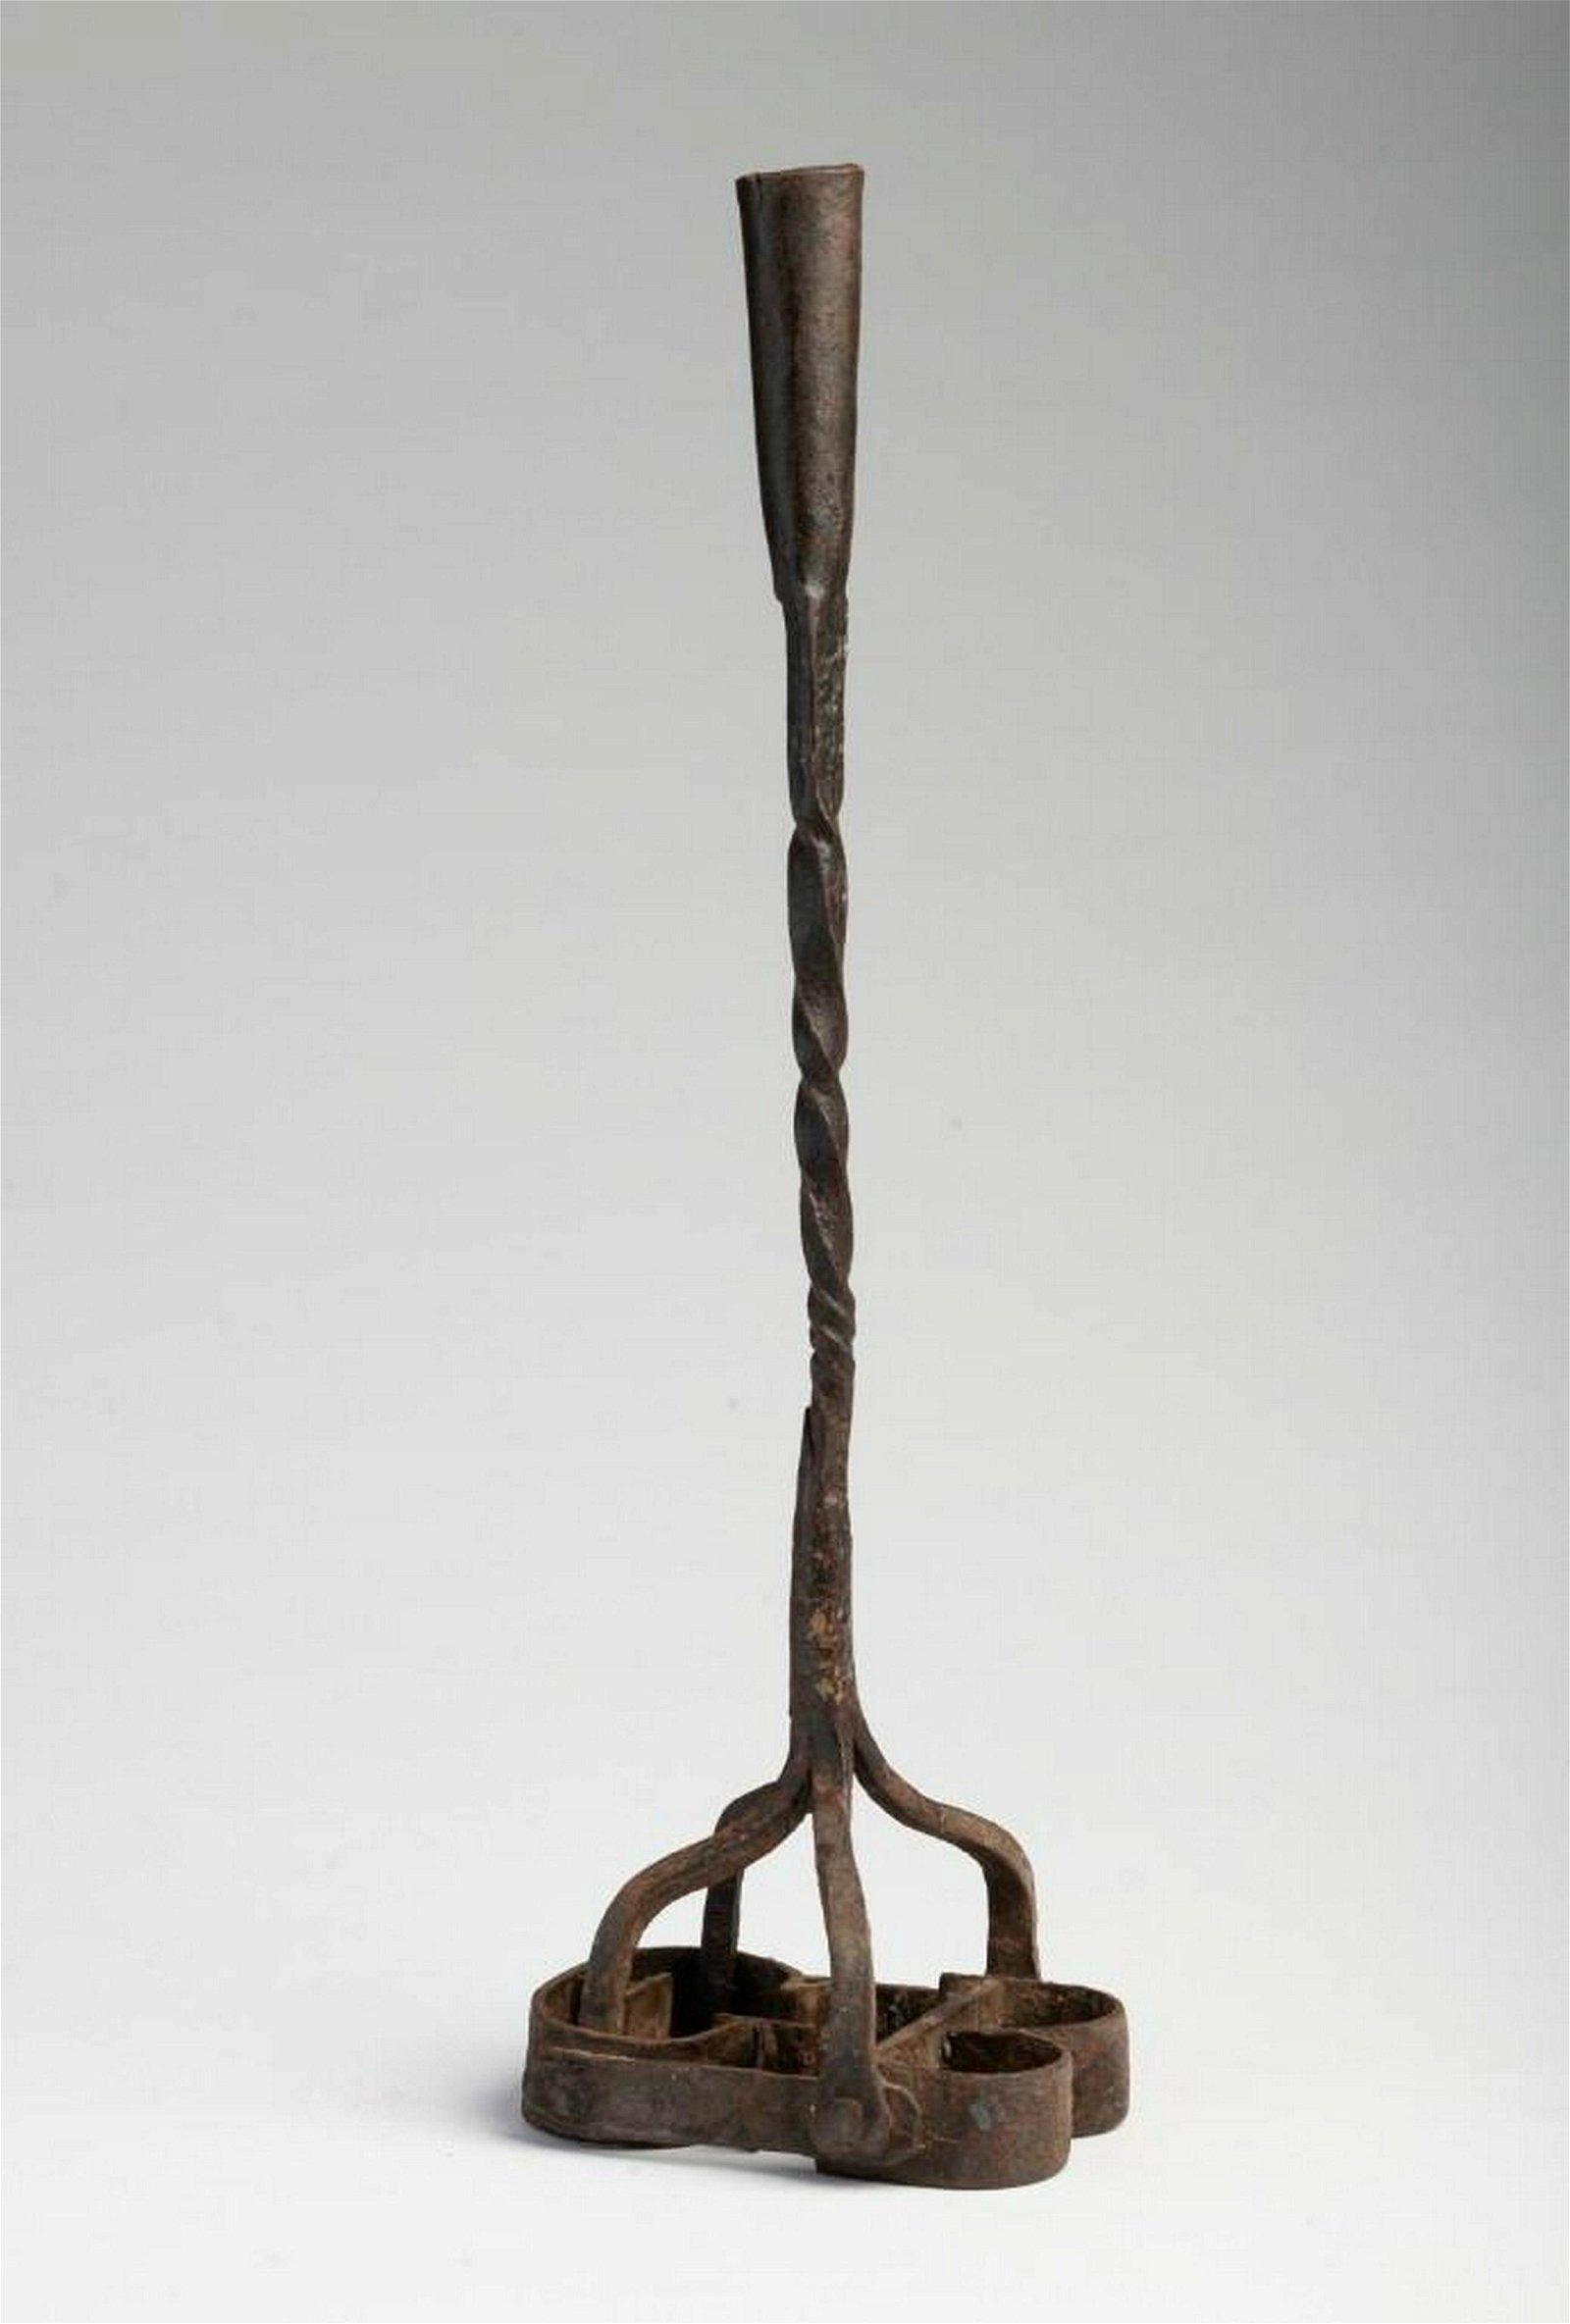 Cast Iron Branding Iron Candlestick.